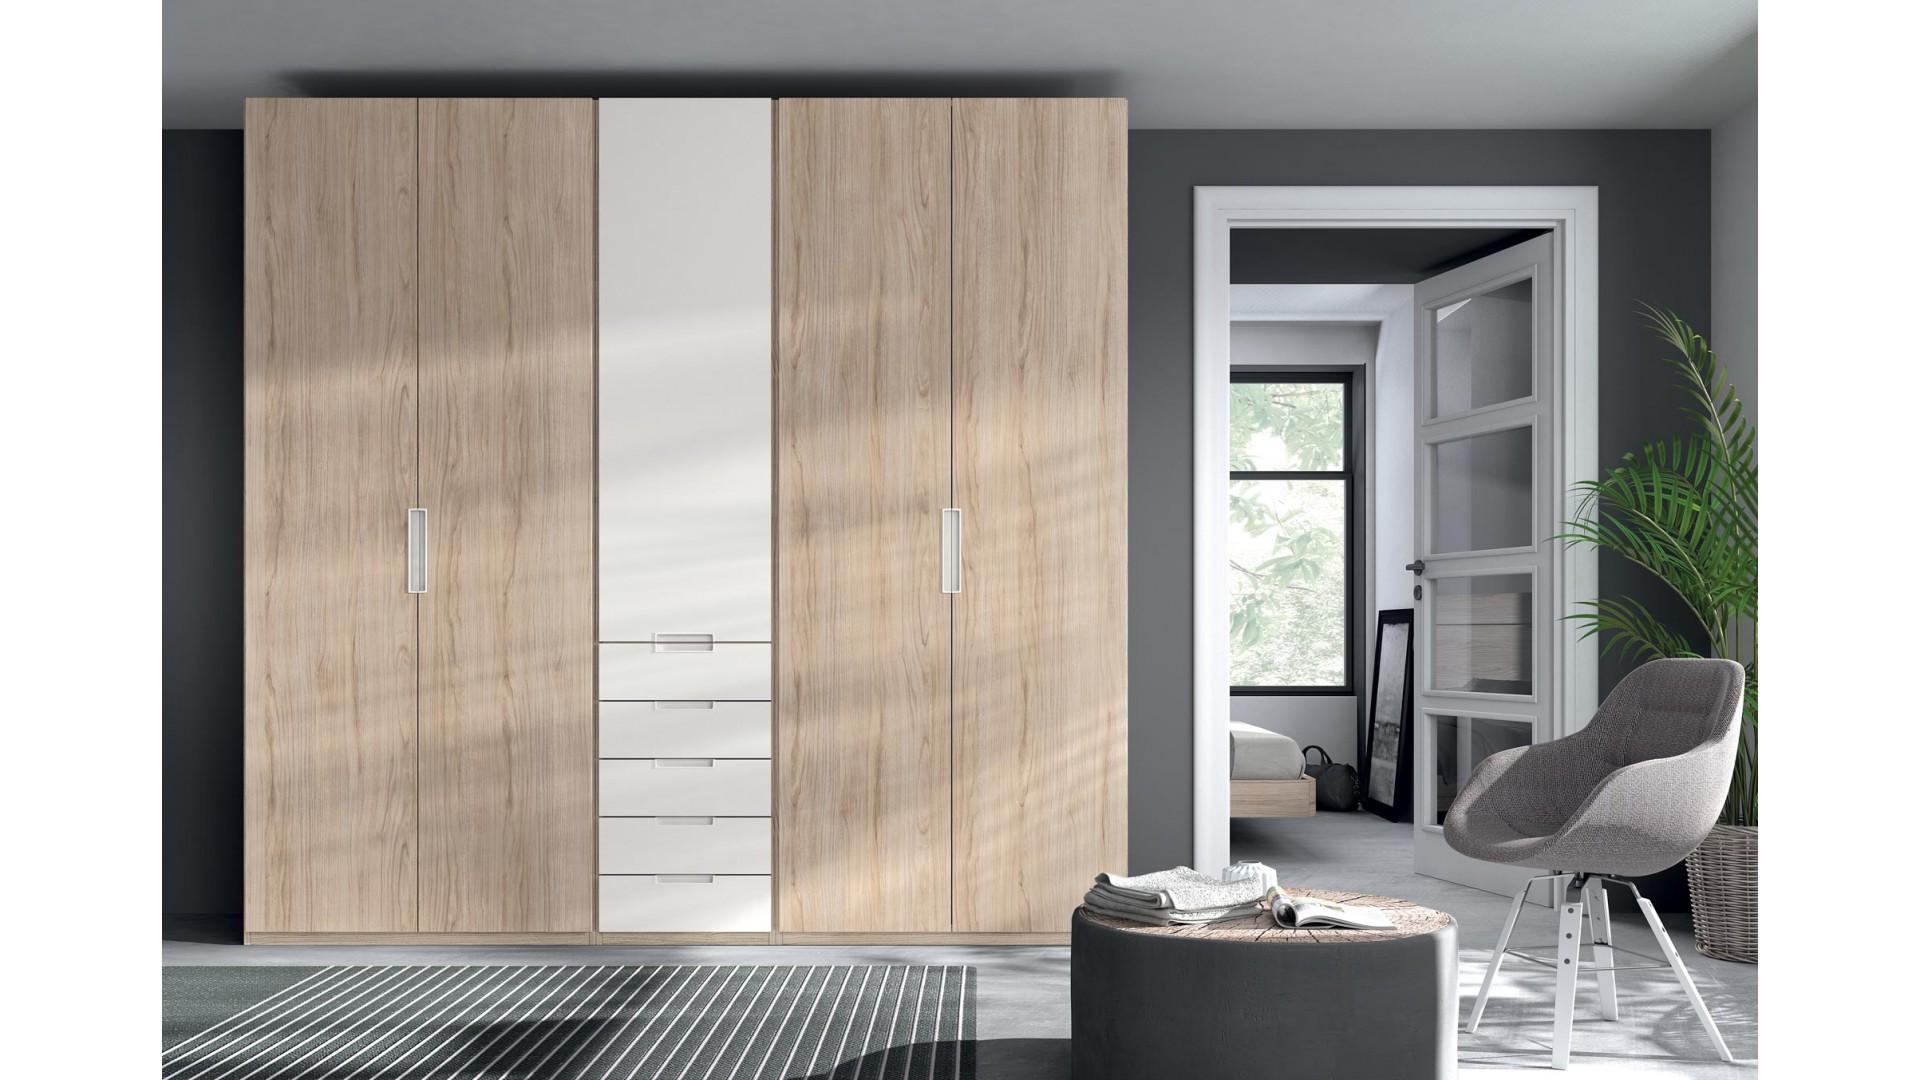 Armoire dressing 5 portes battantes 5 tiroirs PERSONNALISABLE COSMO51 - GLICERIO